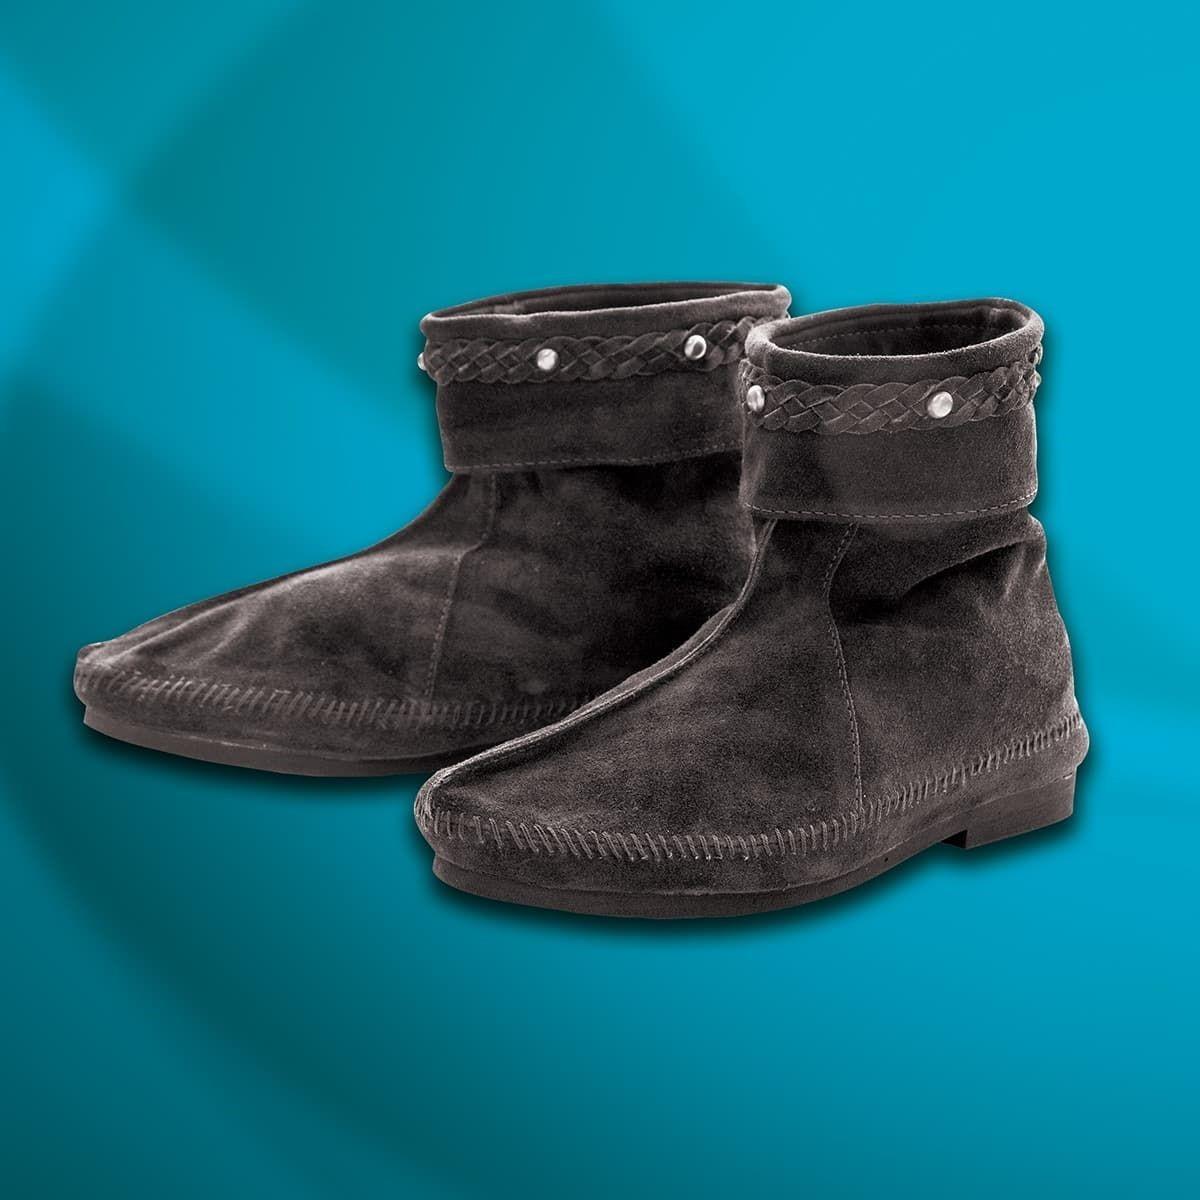 Black Suede Medieval Men's Ankle Boots